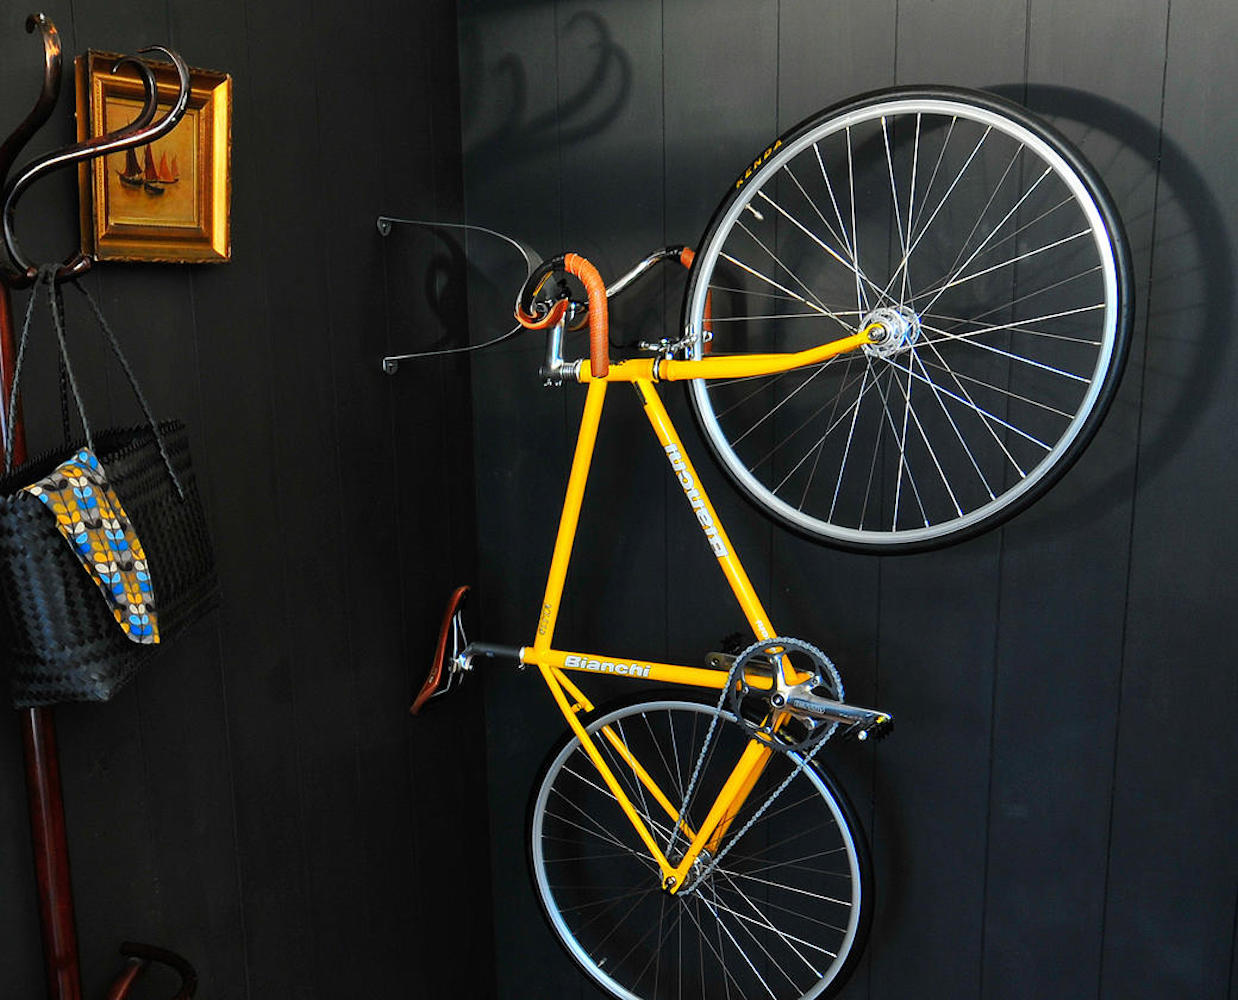 cactus-tongue-ssl-wall-mounted-bike-hanger-04